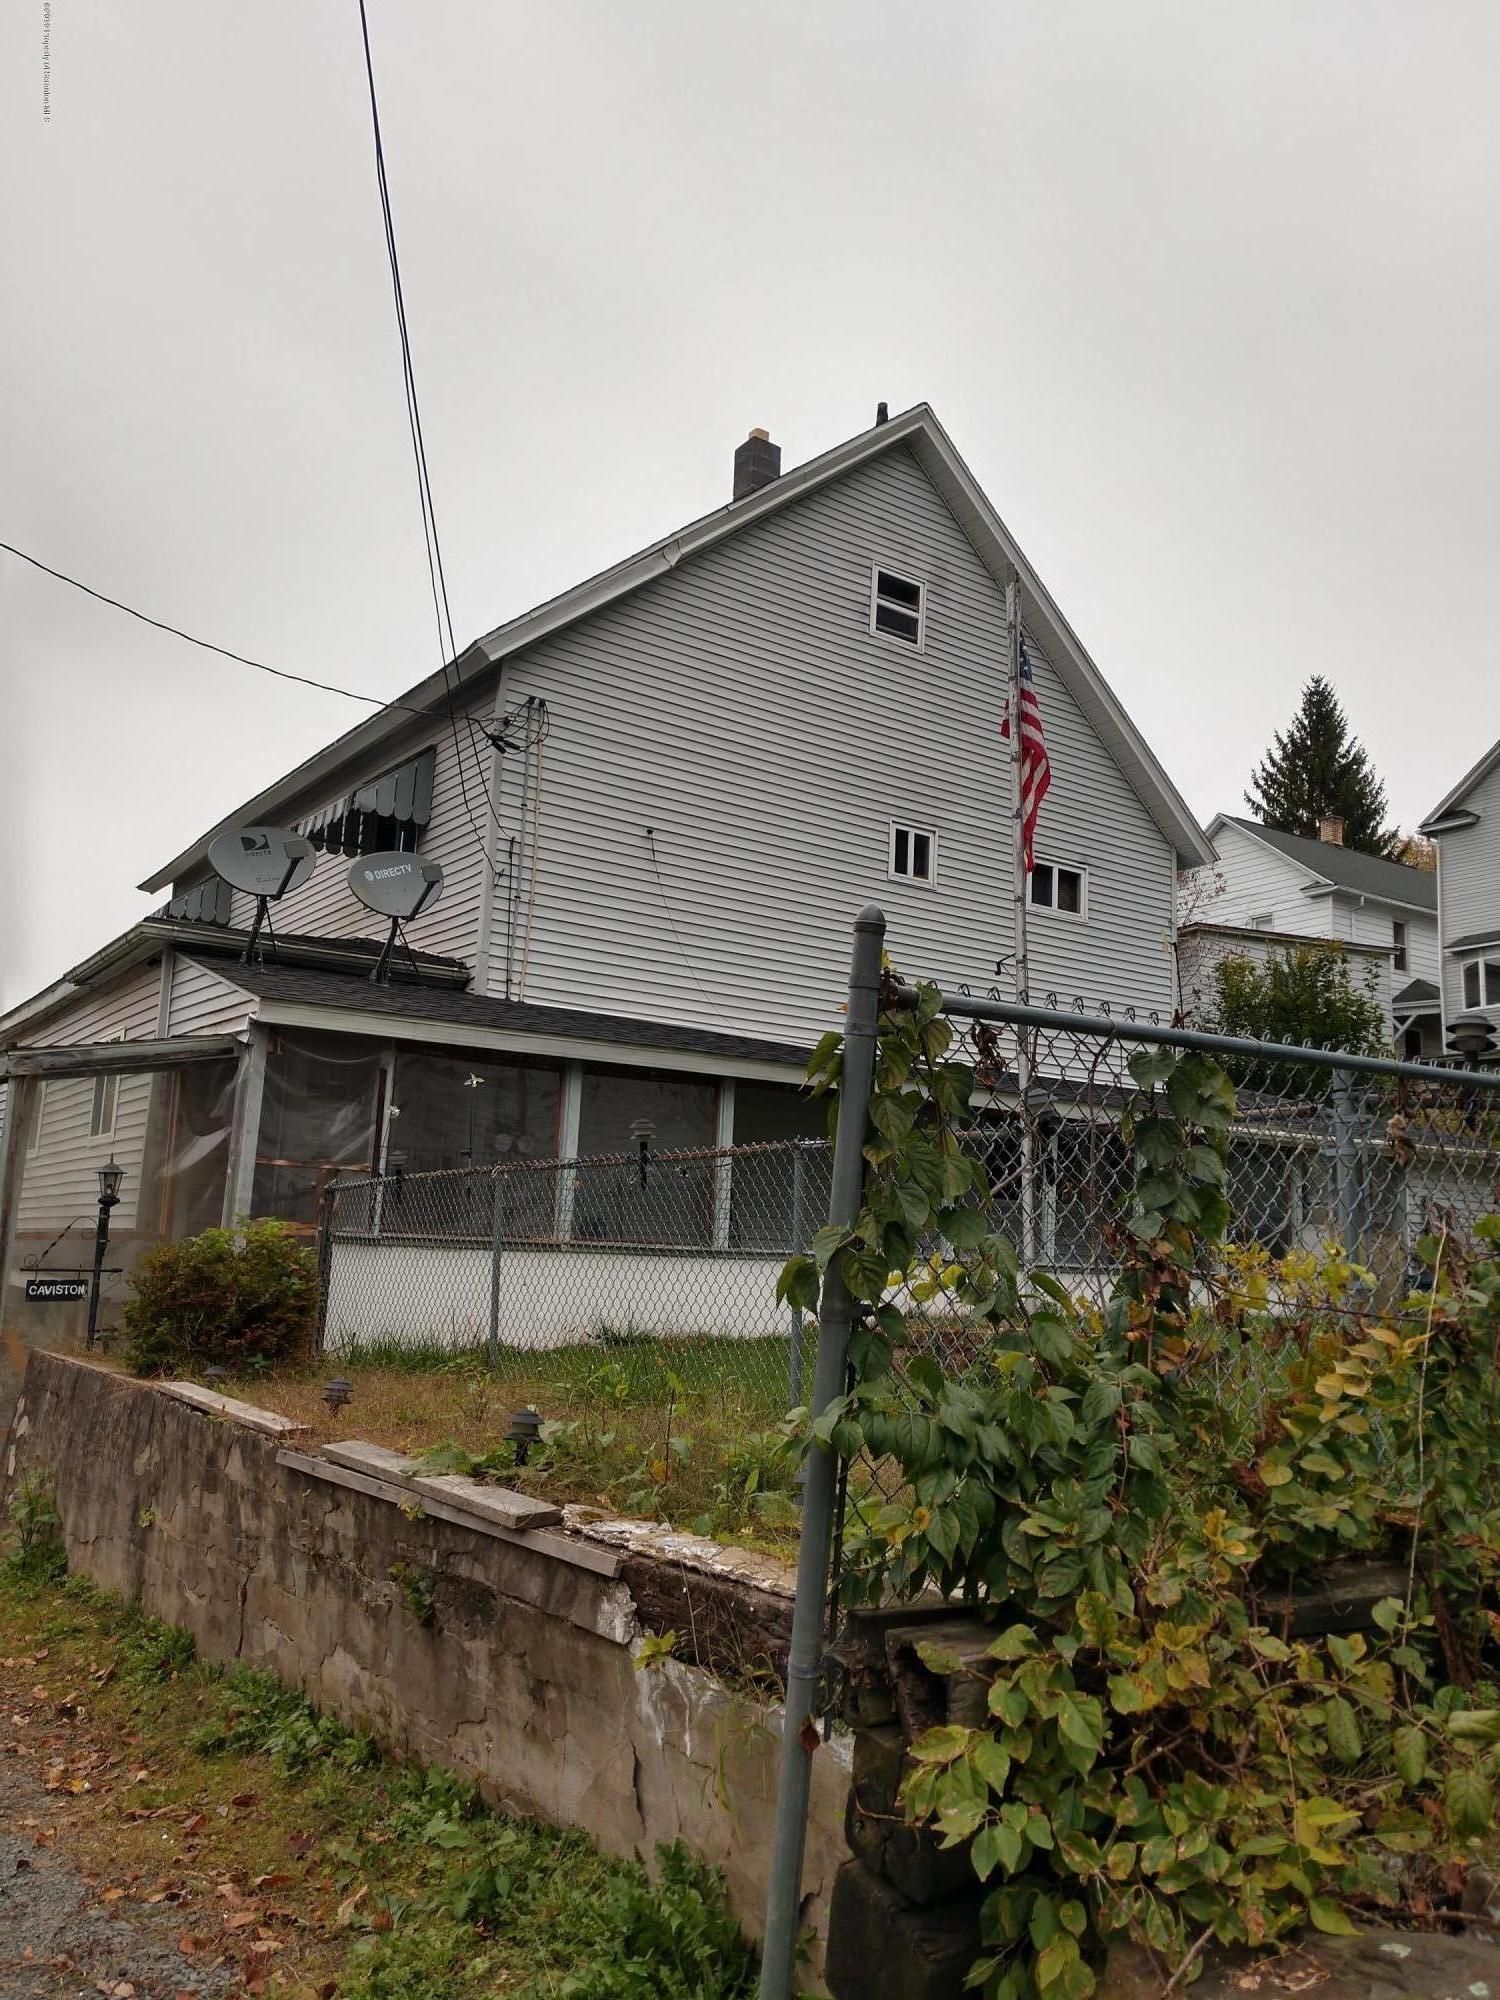 21-23 Rock St, Carbondale, Pennsylvania 18407, ,Multi-Family,For Sale,Rock,19-5025